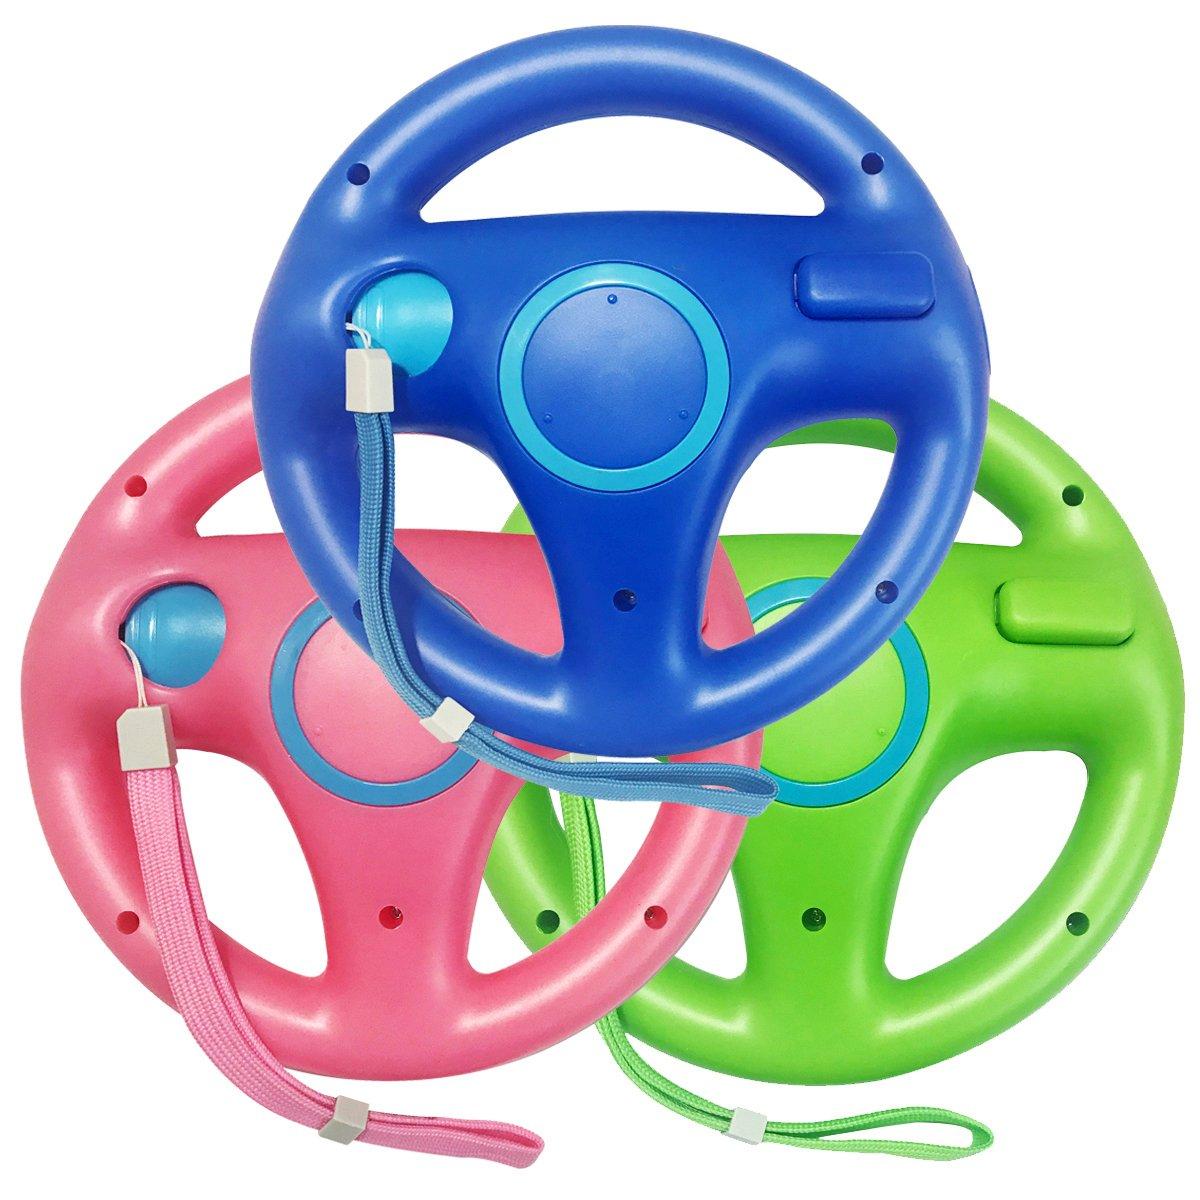 Jadebones 3pcs Blue Pink Green Mario Kart Steering Wheel With Wrist Strap for Nintendo Wii